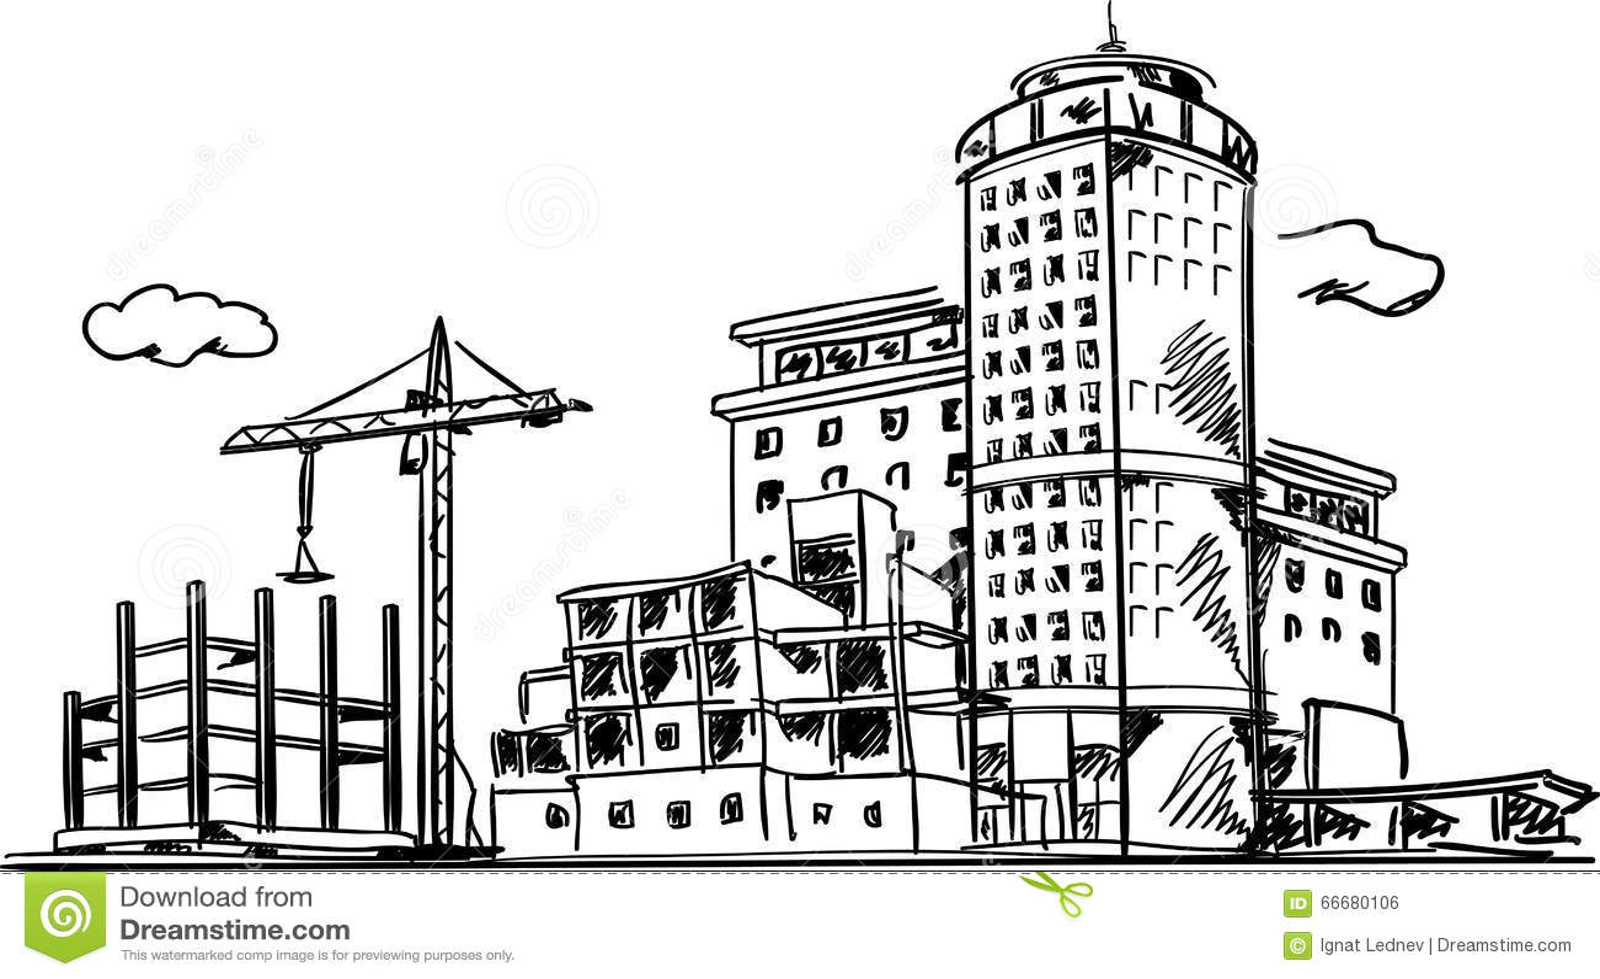 Building Construction Drawings : City construction sketch vector illustration